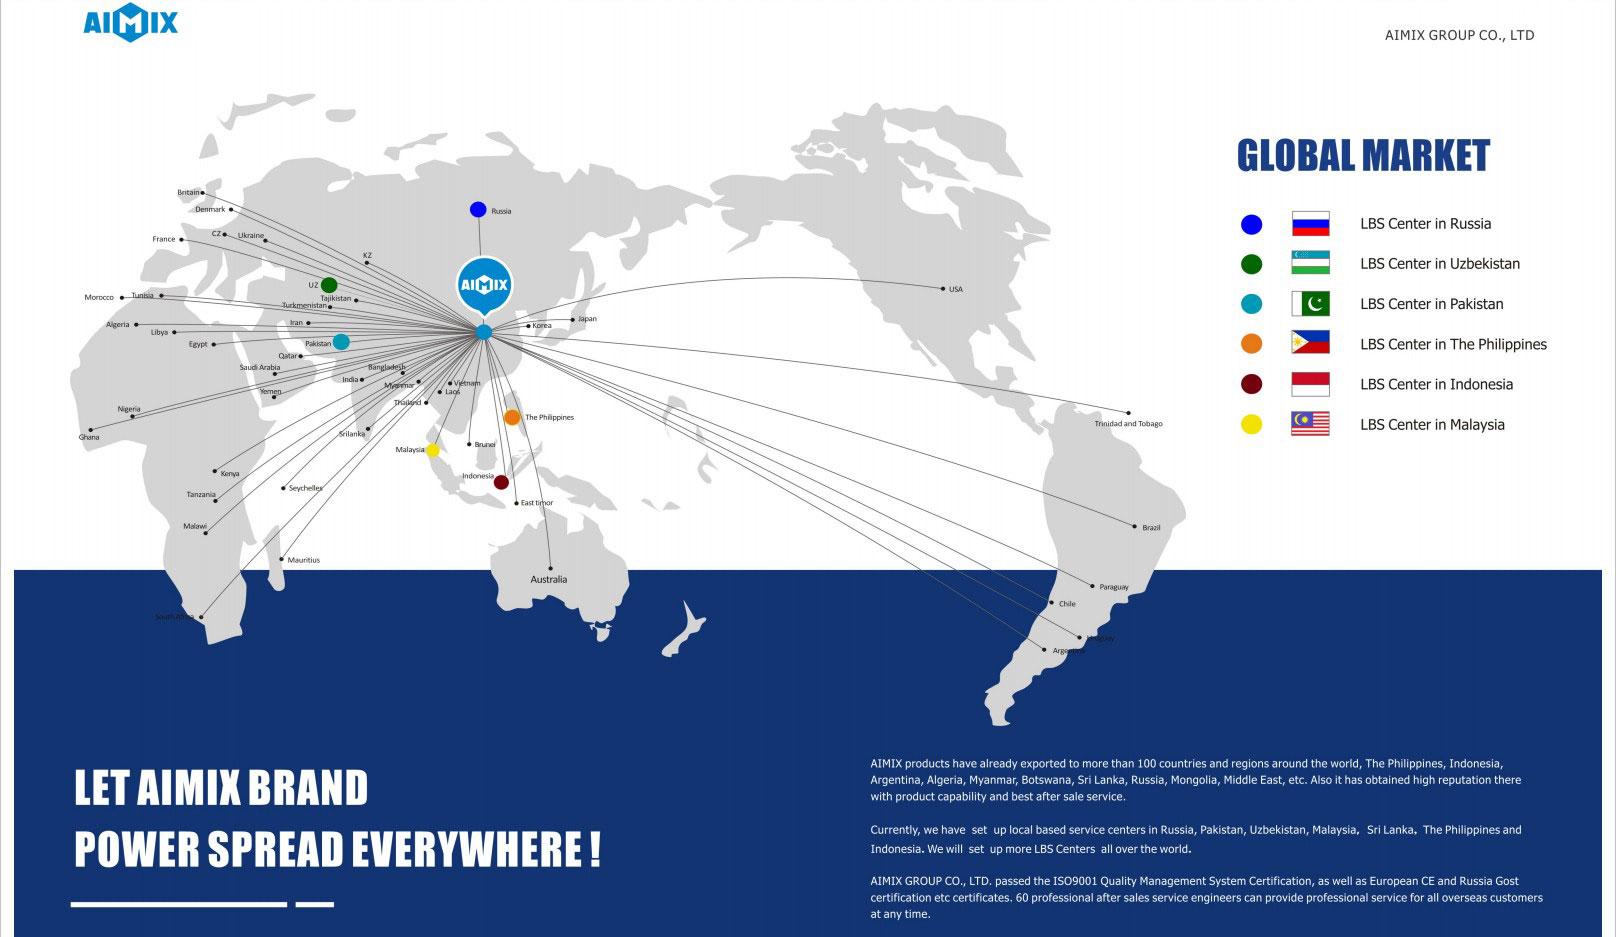 AIMIX 그룹 글로벌 시장